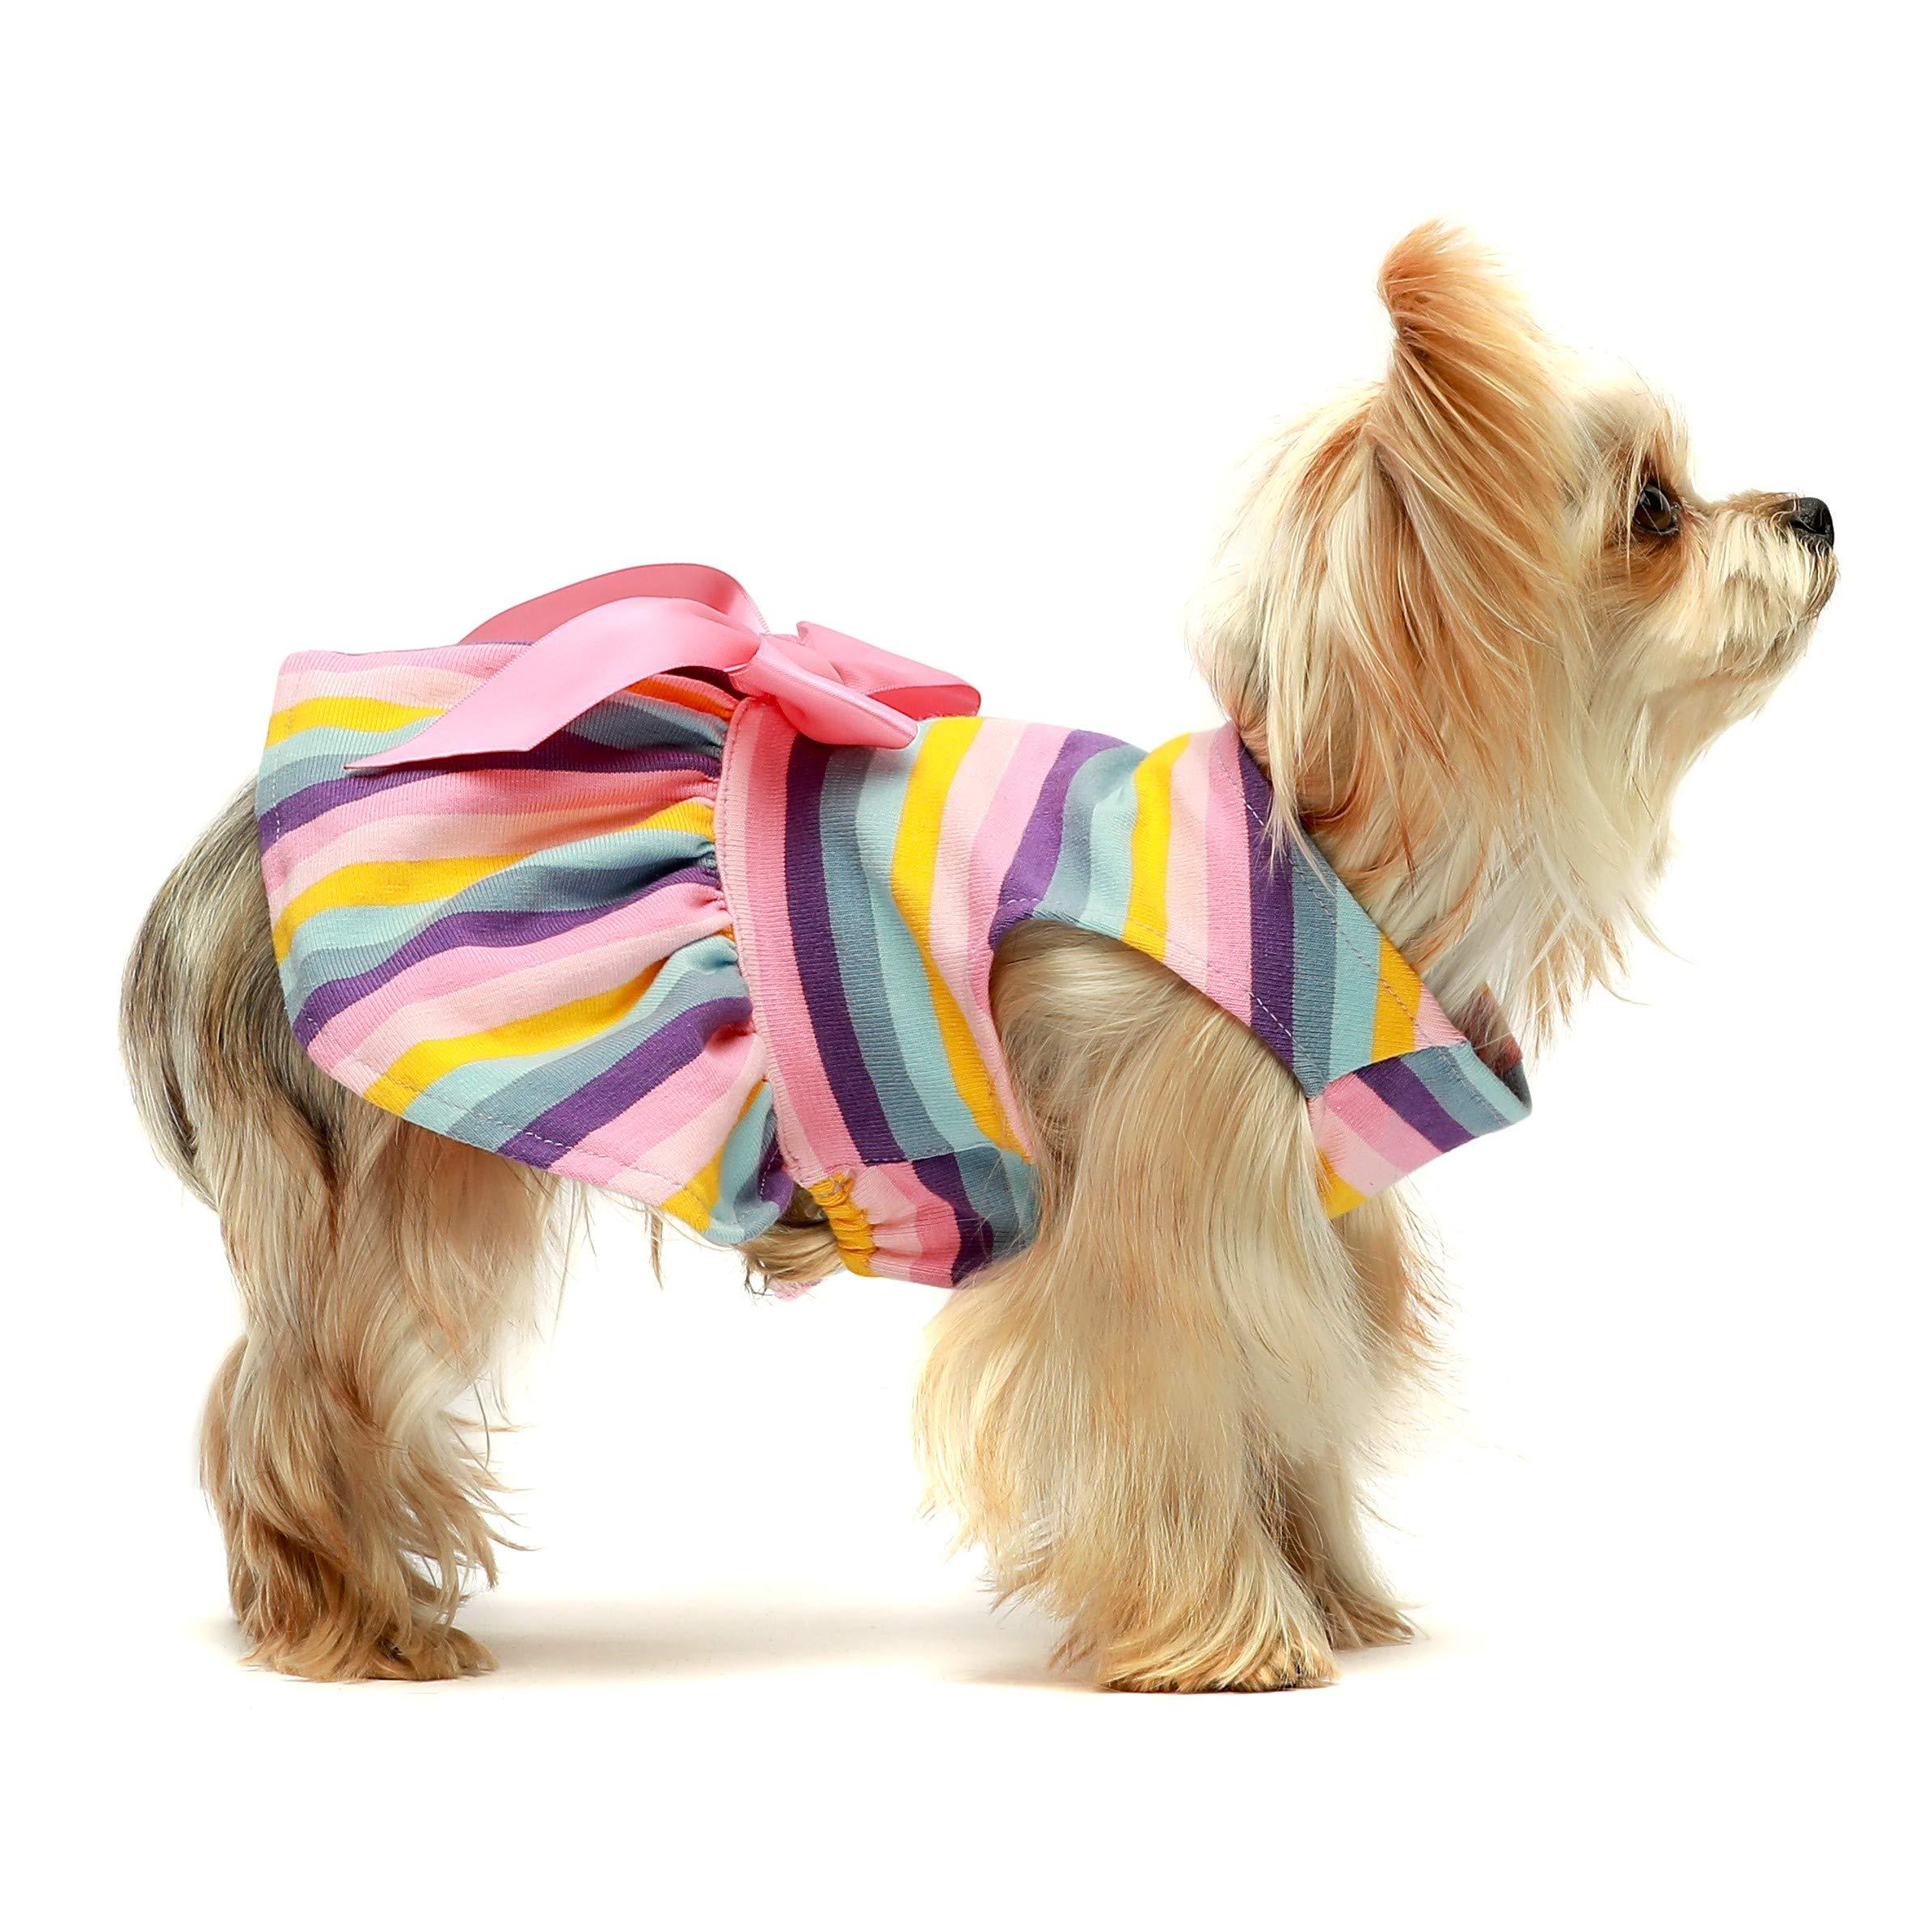 Fitwarm 100% Cotton Dog Dresses Pet Clothes for Doggie Striped Dress Cat Vest Puppy Shirts Colorful Rainbow Pink